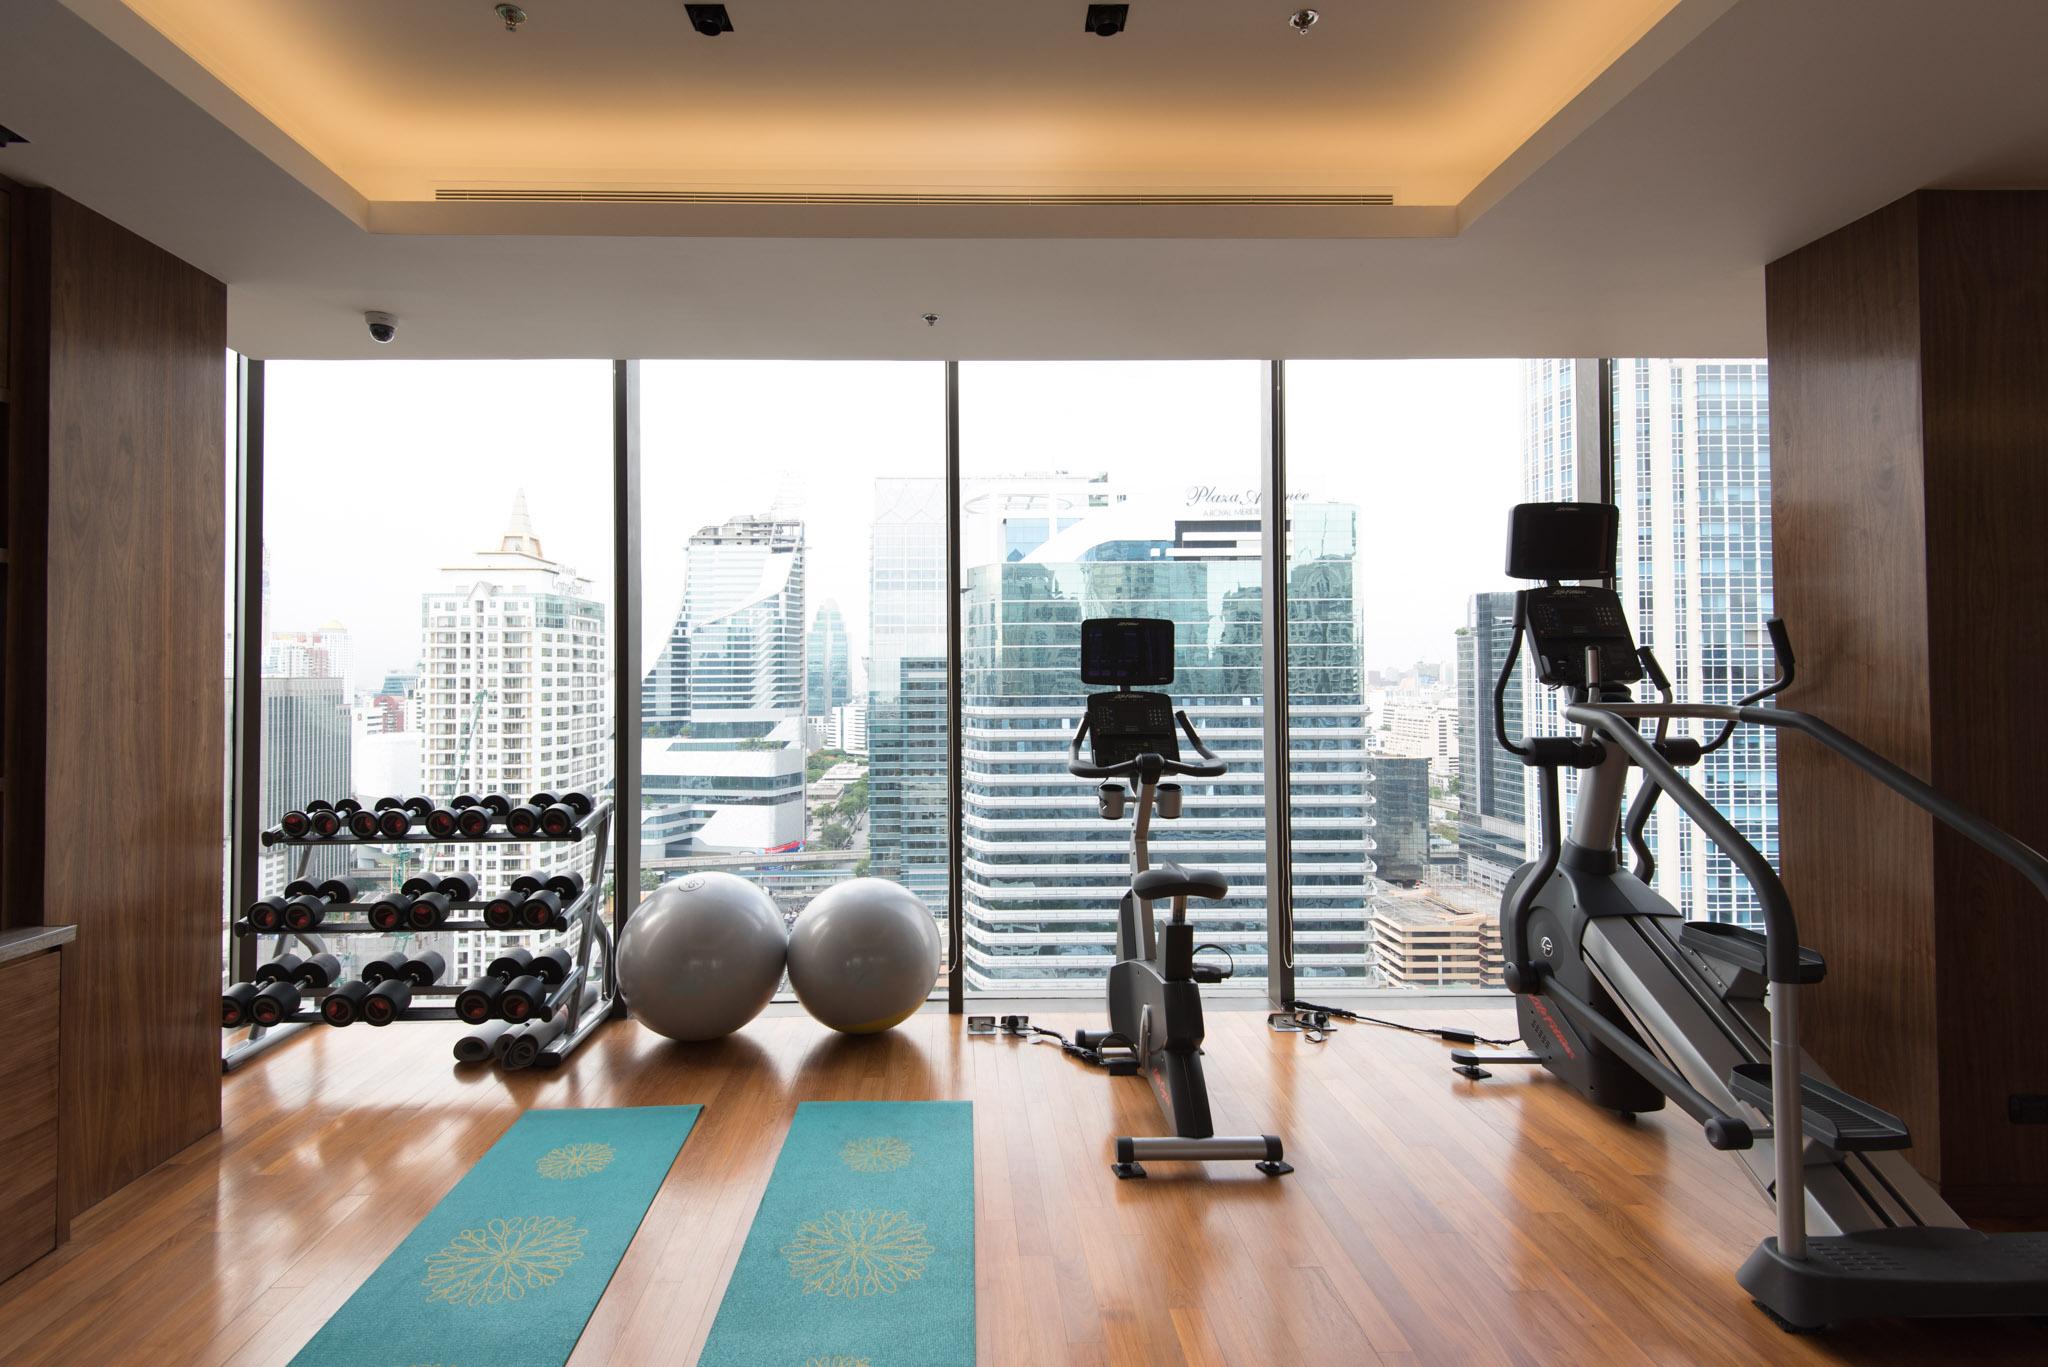 Gym - Hotel Indigo Bangkok Wireless Road